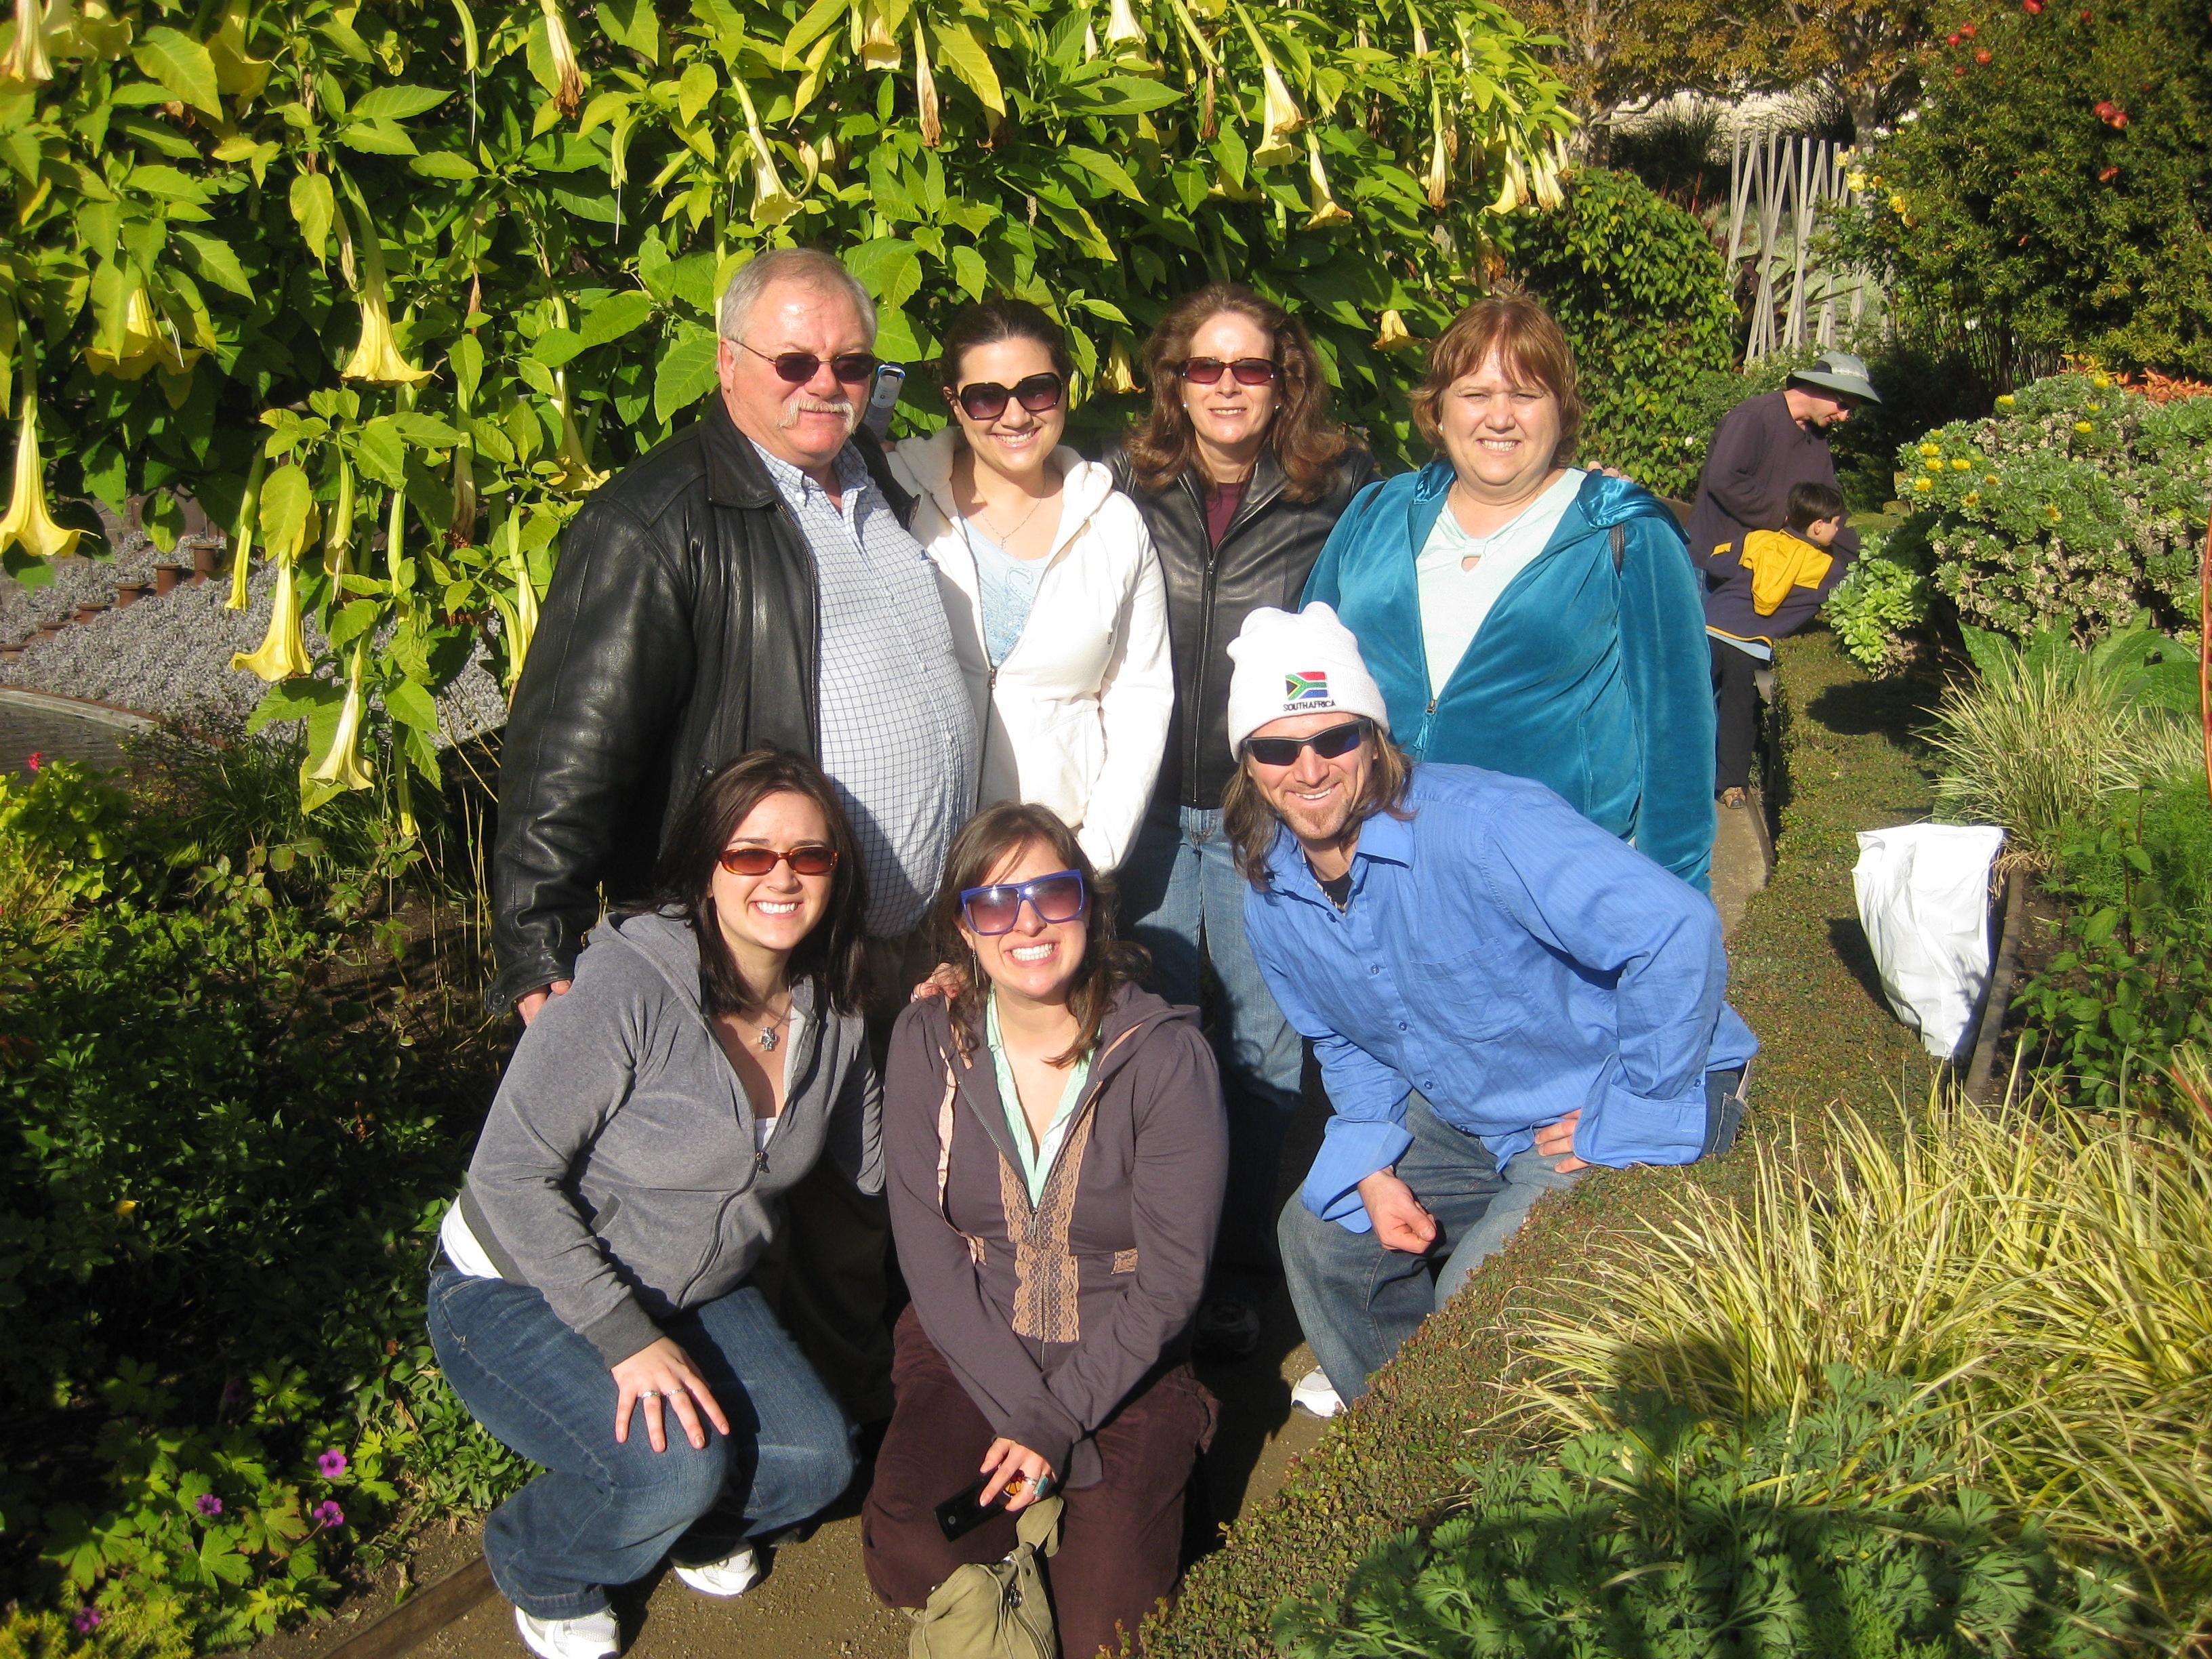 Illana, Aunt Alice and the Hargrove's